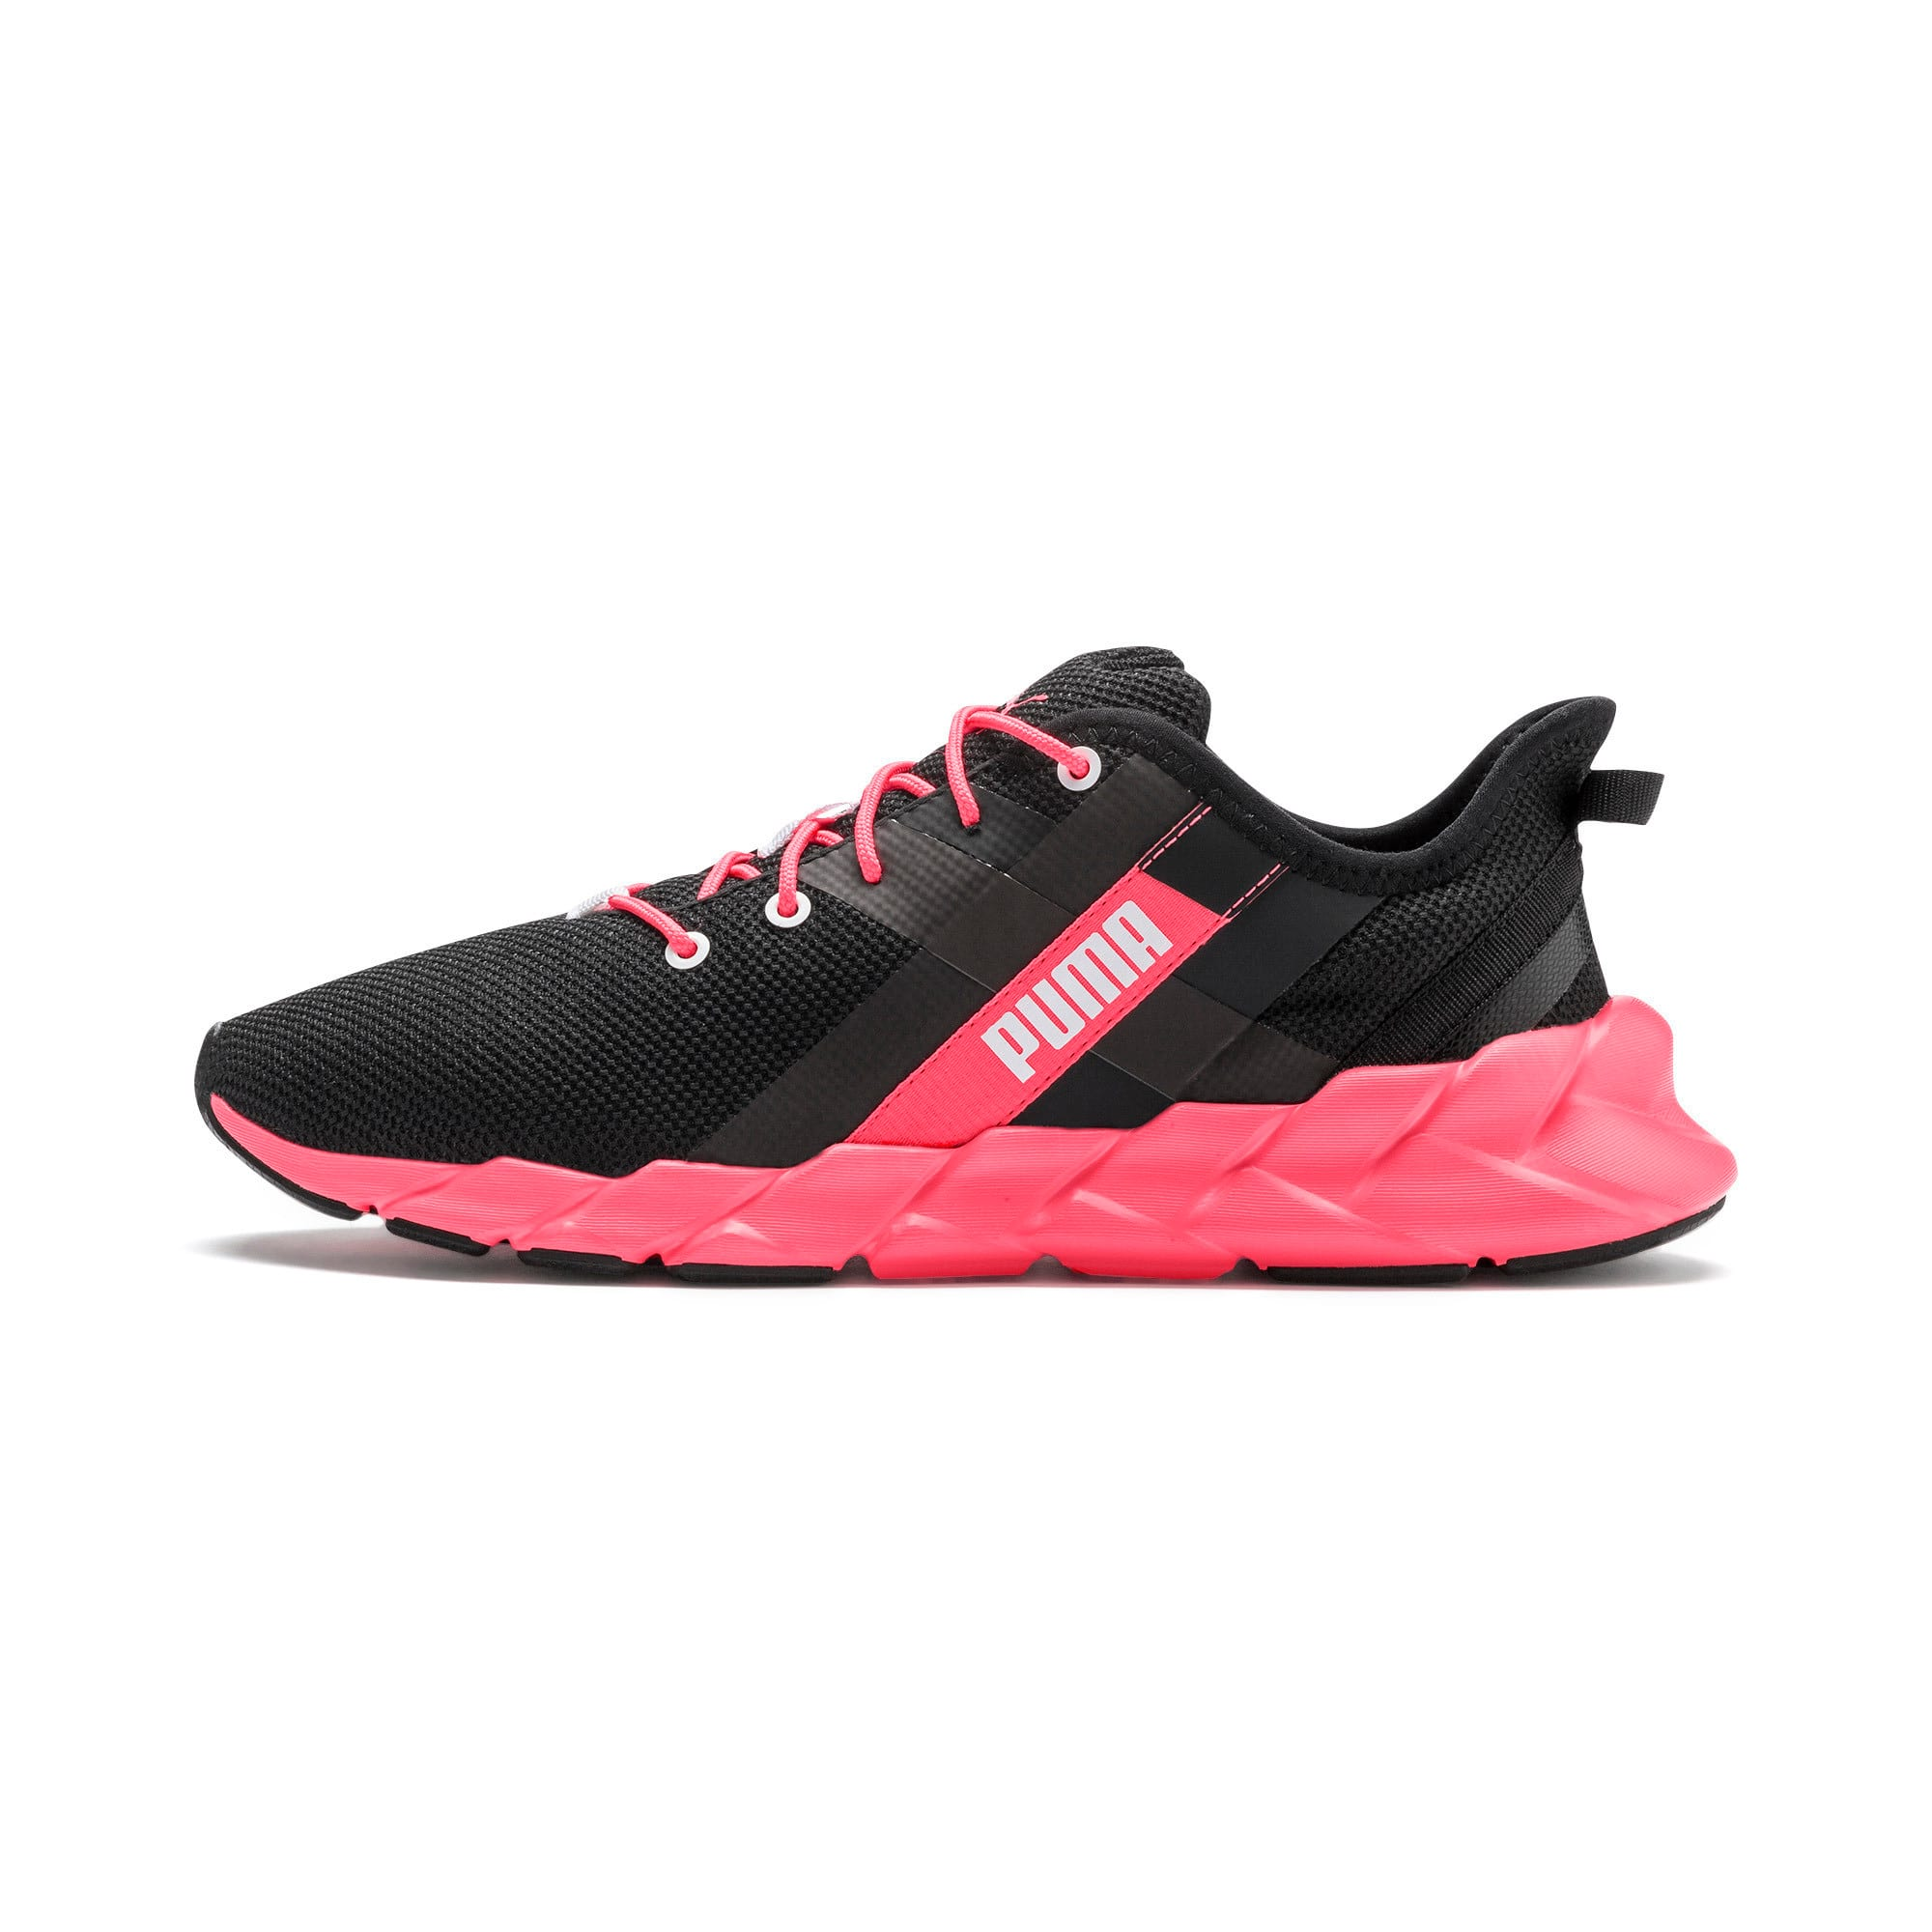 Thumbnail 1 of Weave XT Women's Training Shoes, Puma Black-Pink Alert, medium